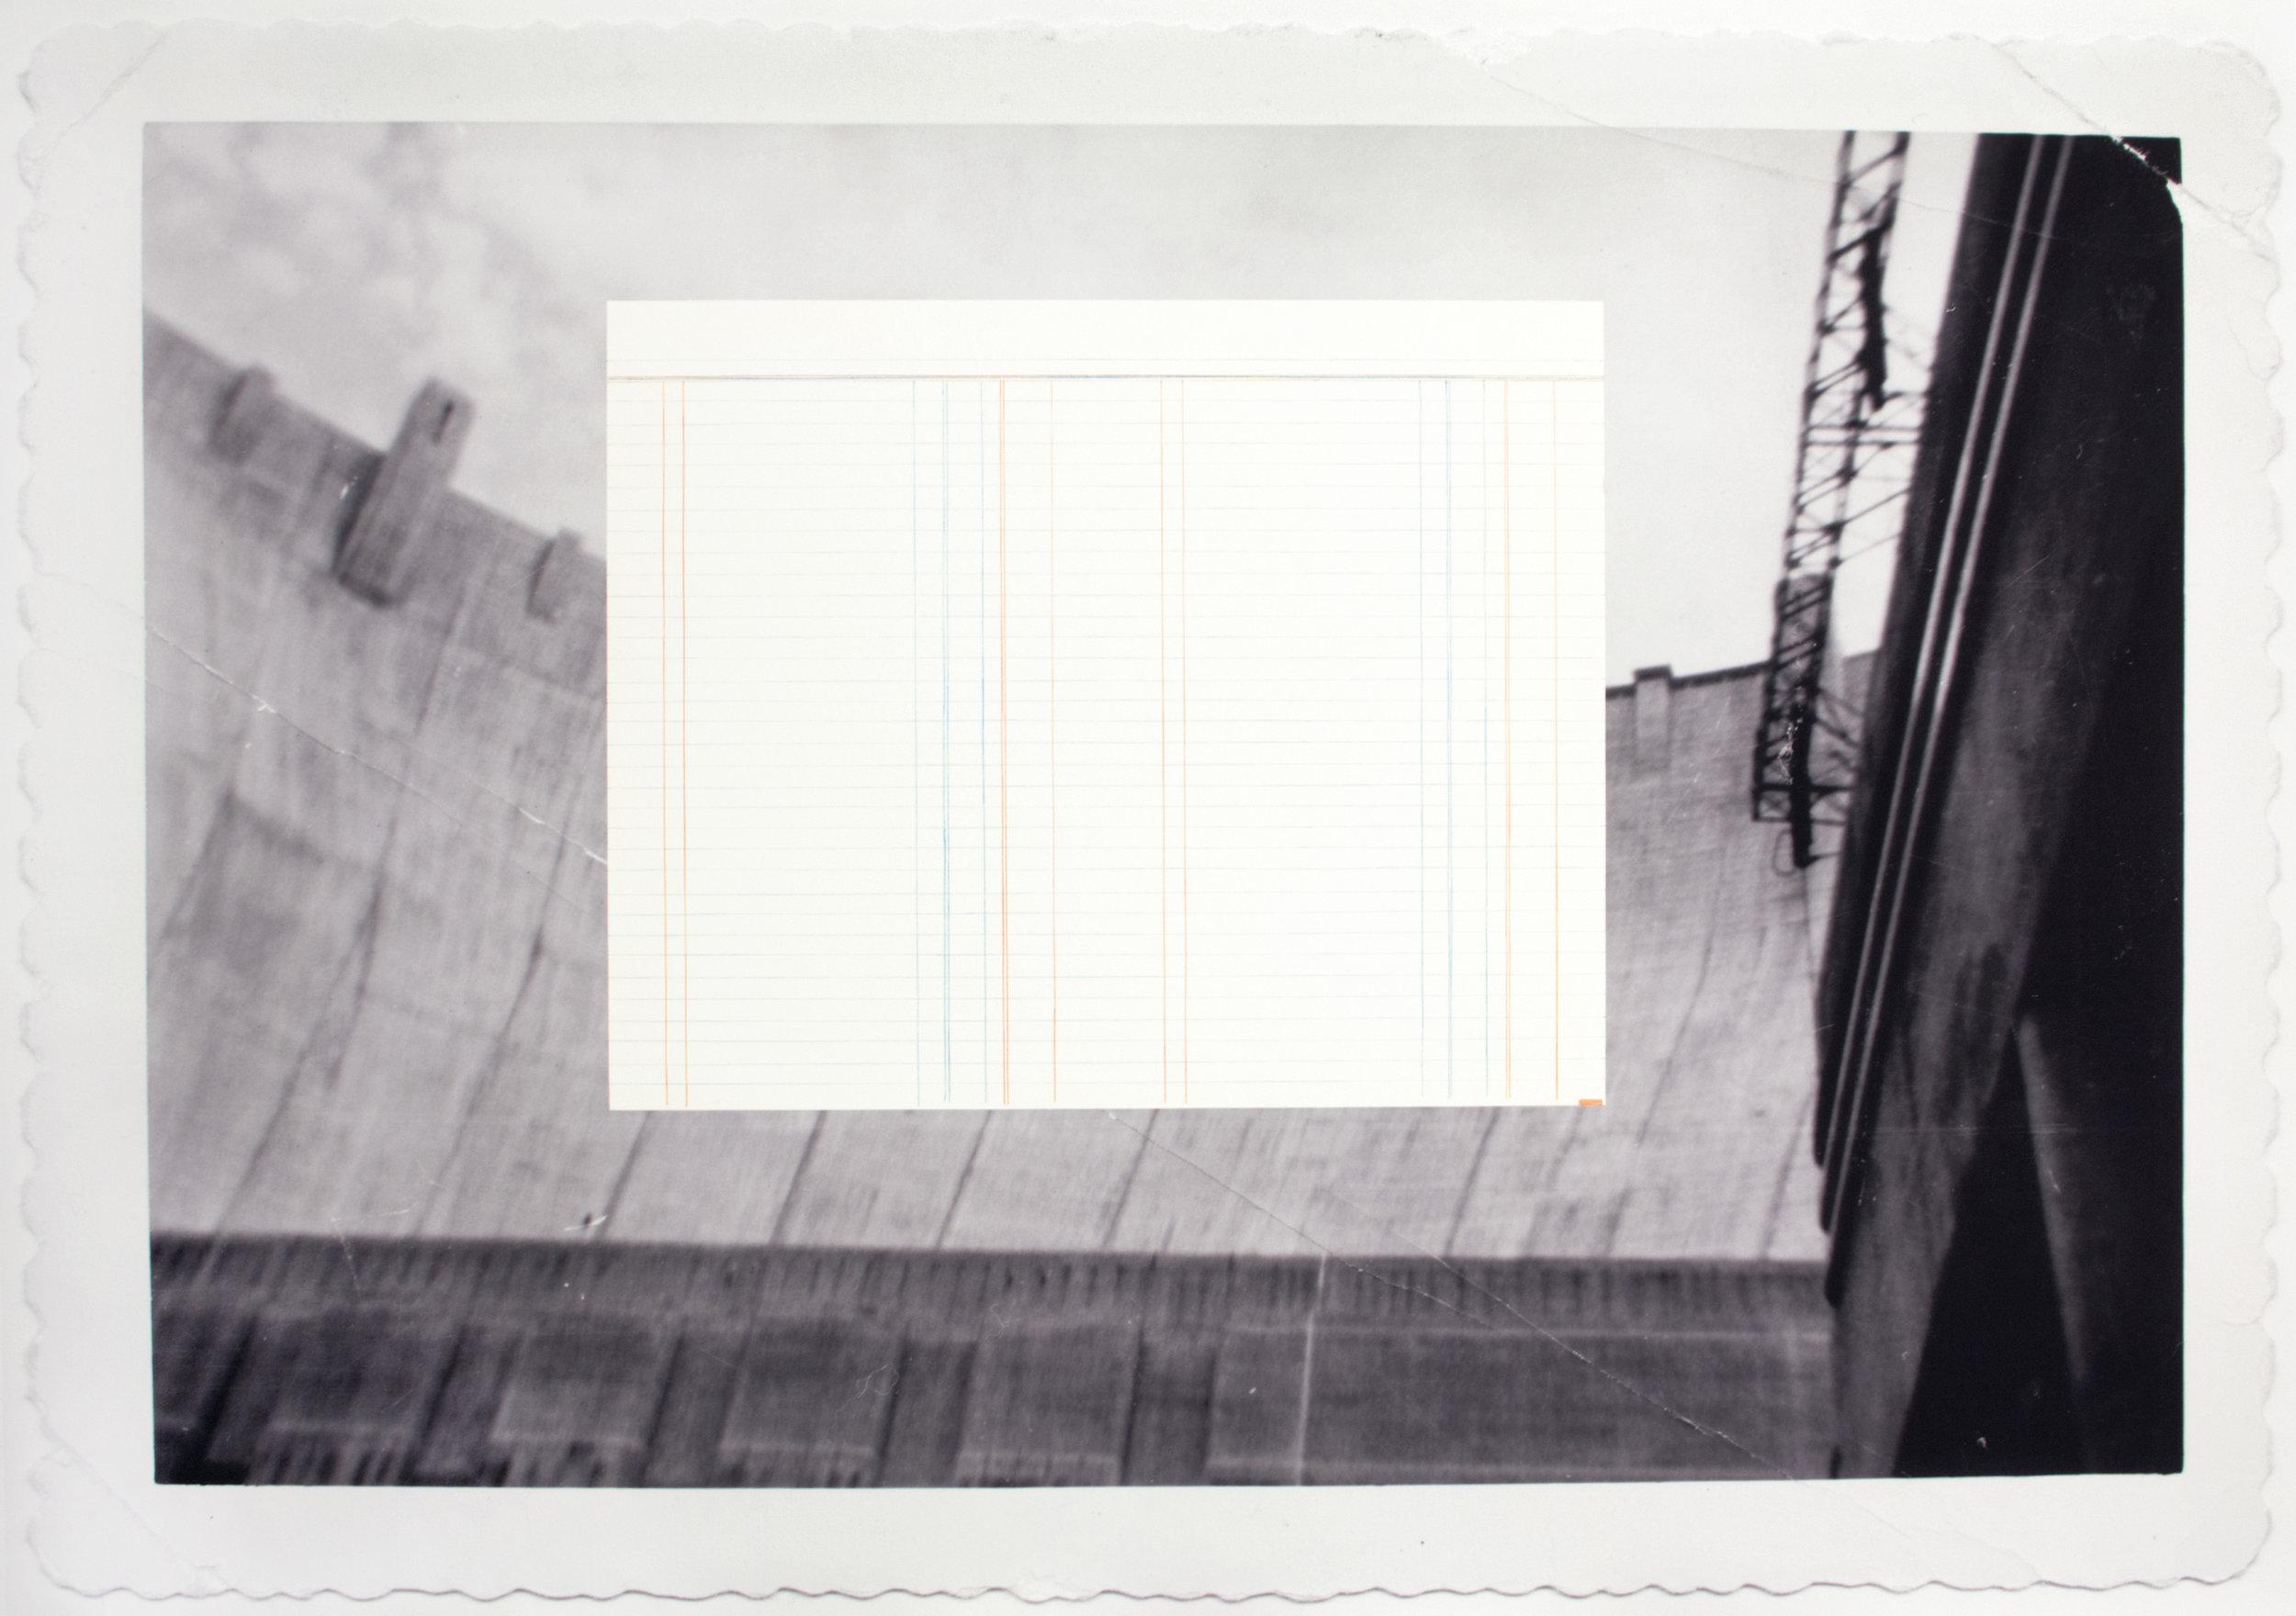 Hoover Dam  2015  Hahnamuela archival inkjet paper, pastel, pencil  34 X 24 Inches